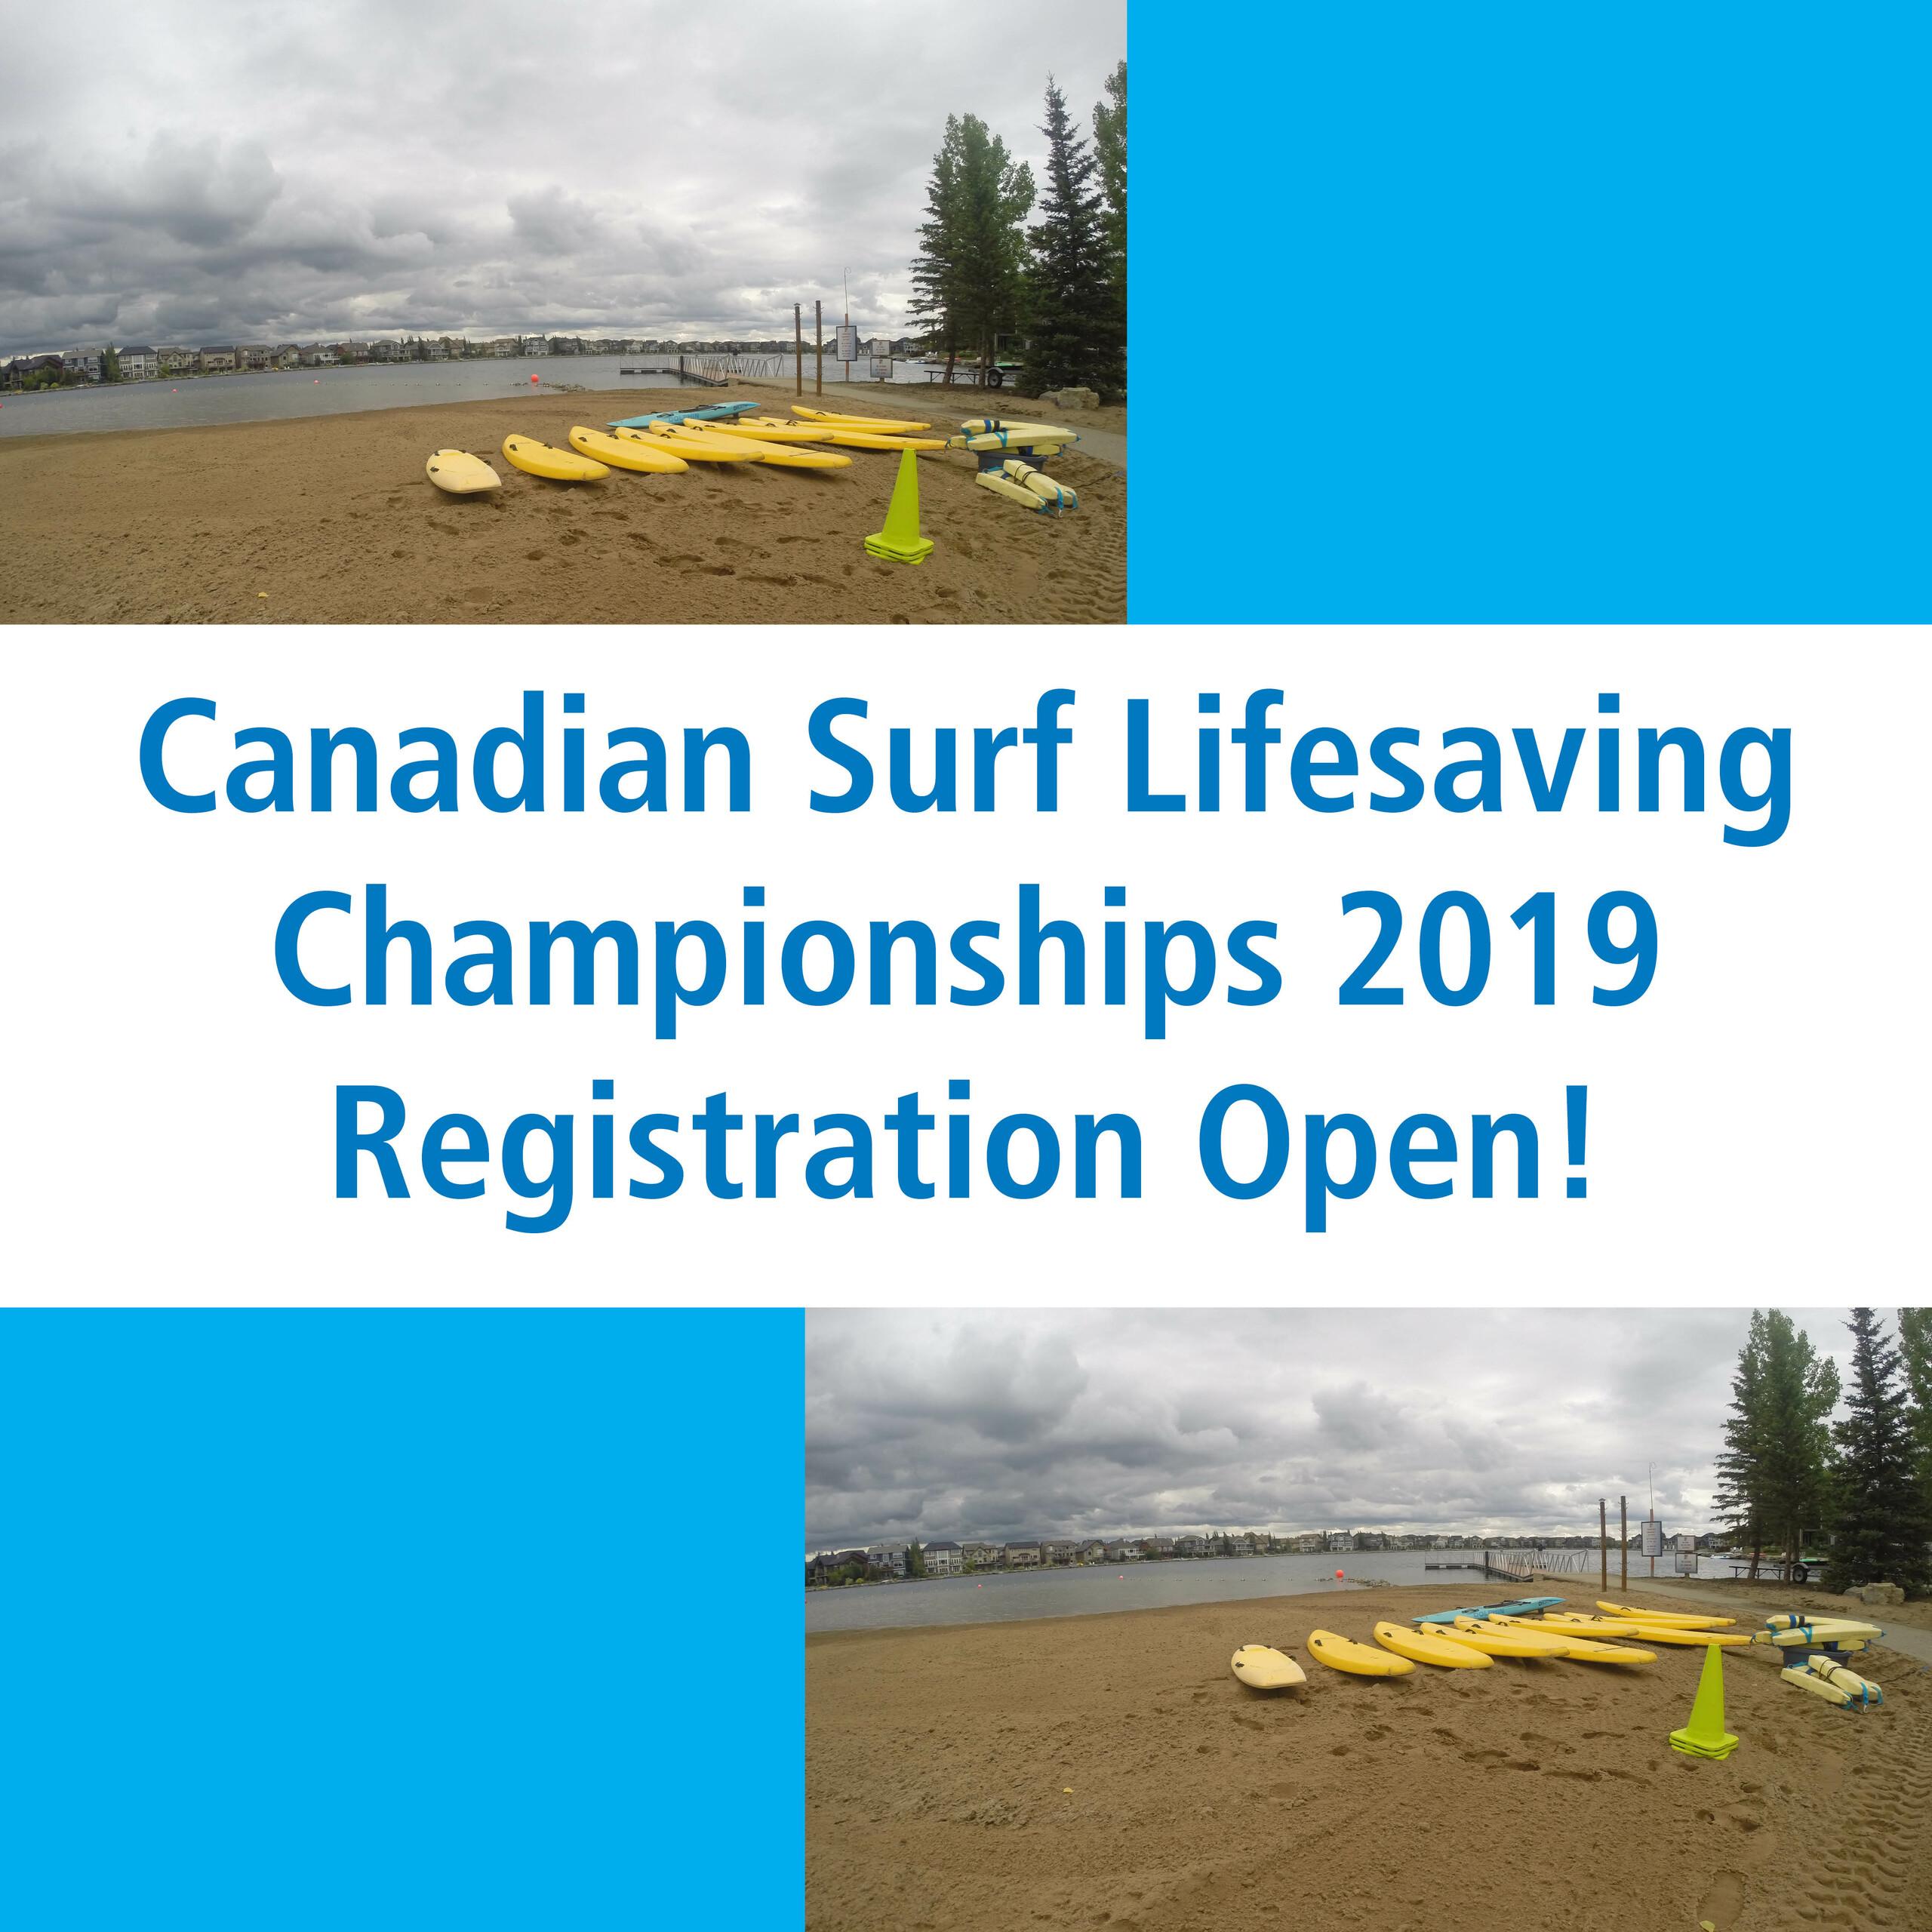 Canadian Surf Lifesaving Championships 2019: News